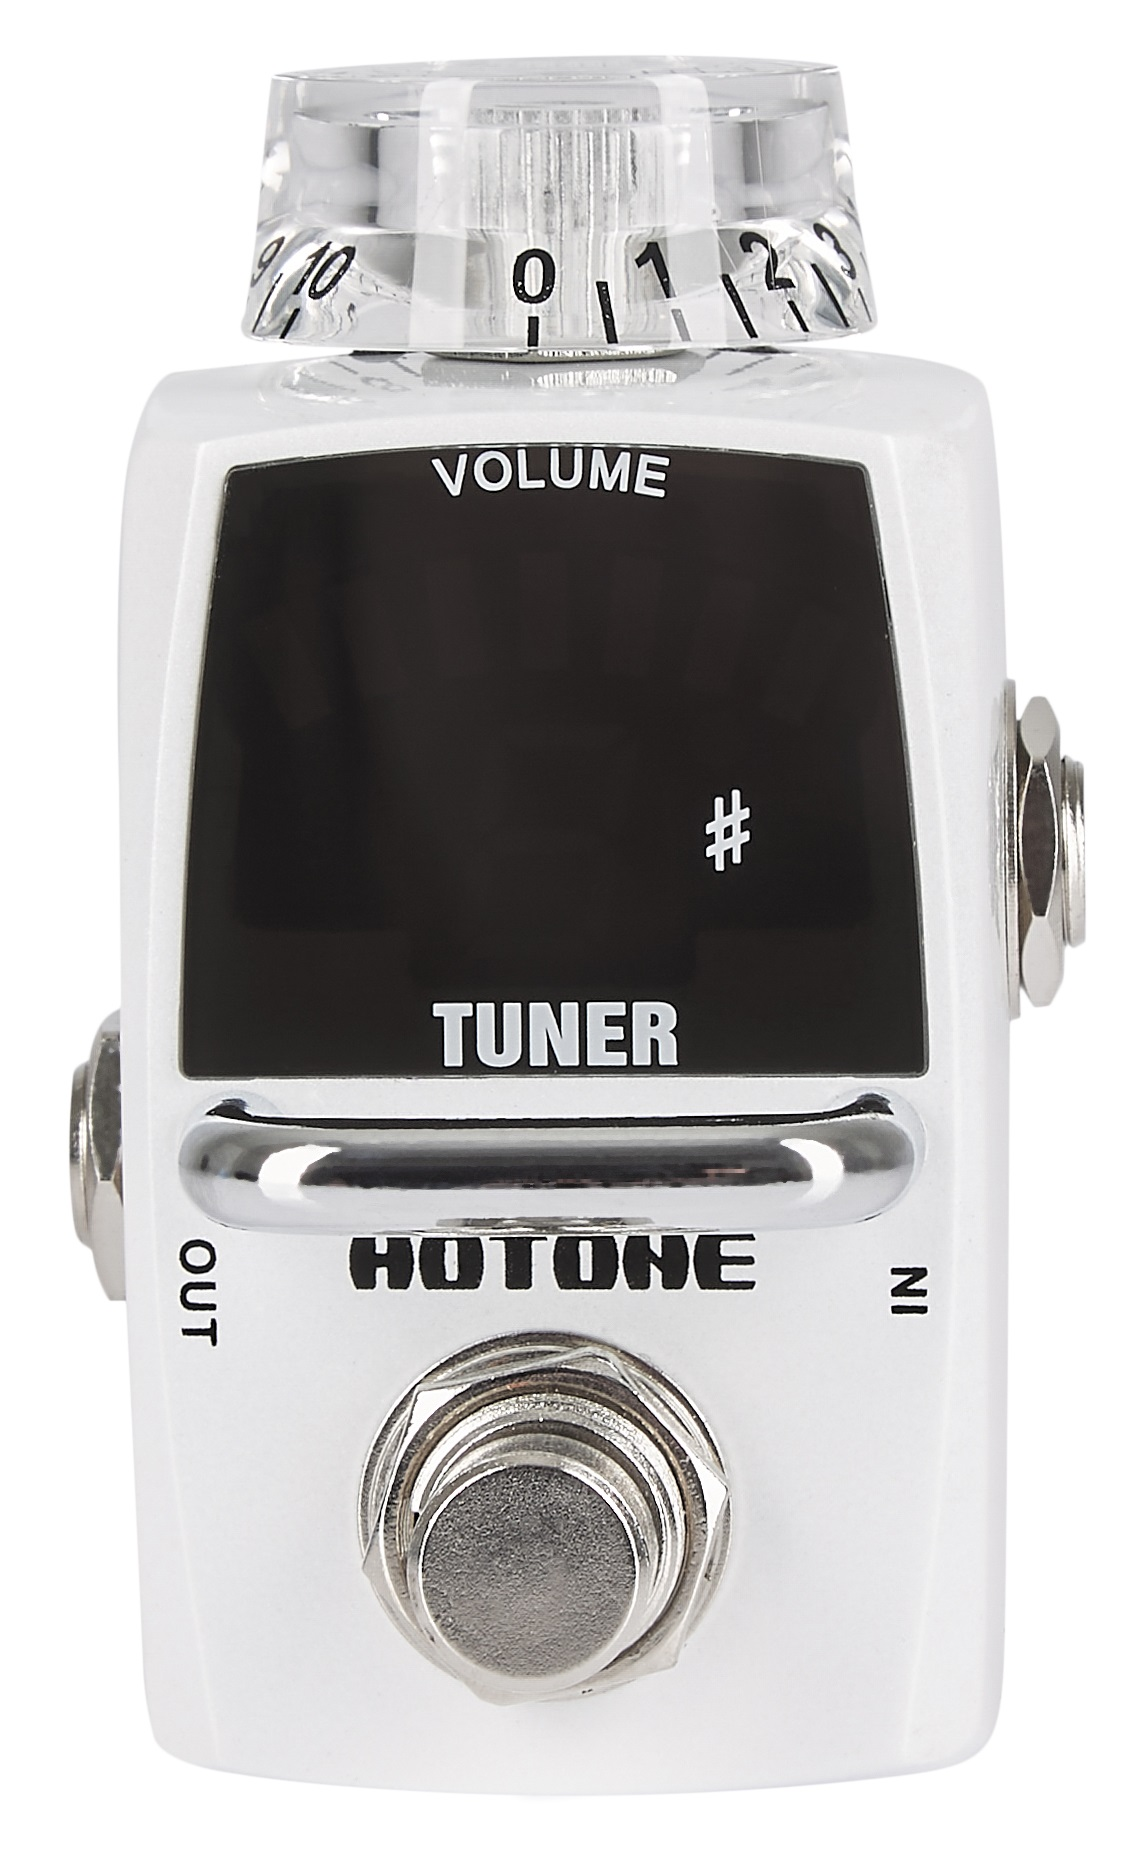 Hotone Tuner